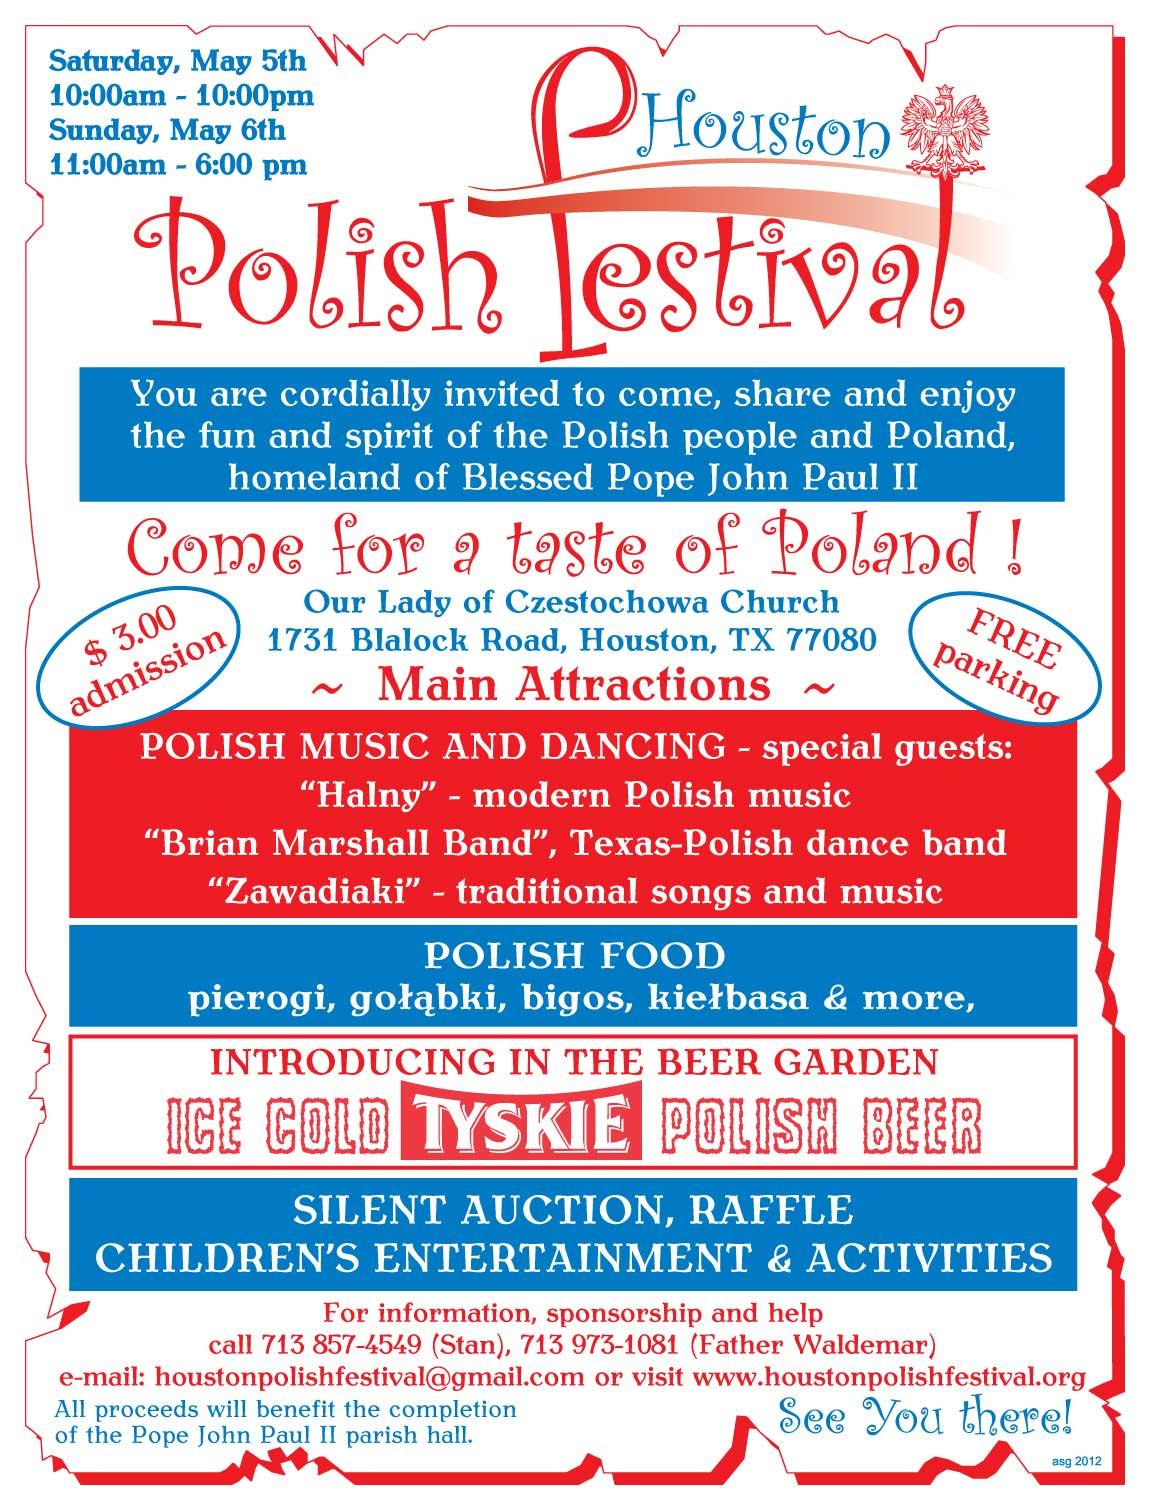 6th Annual Houston Polish Festival